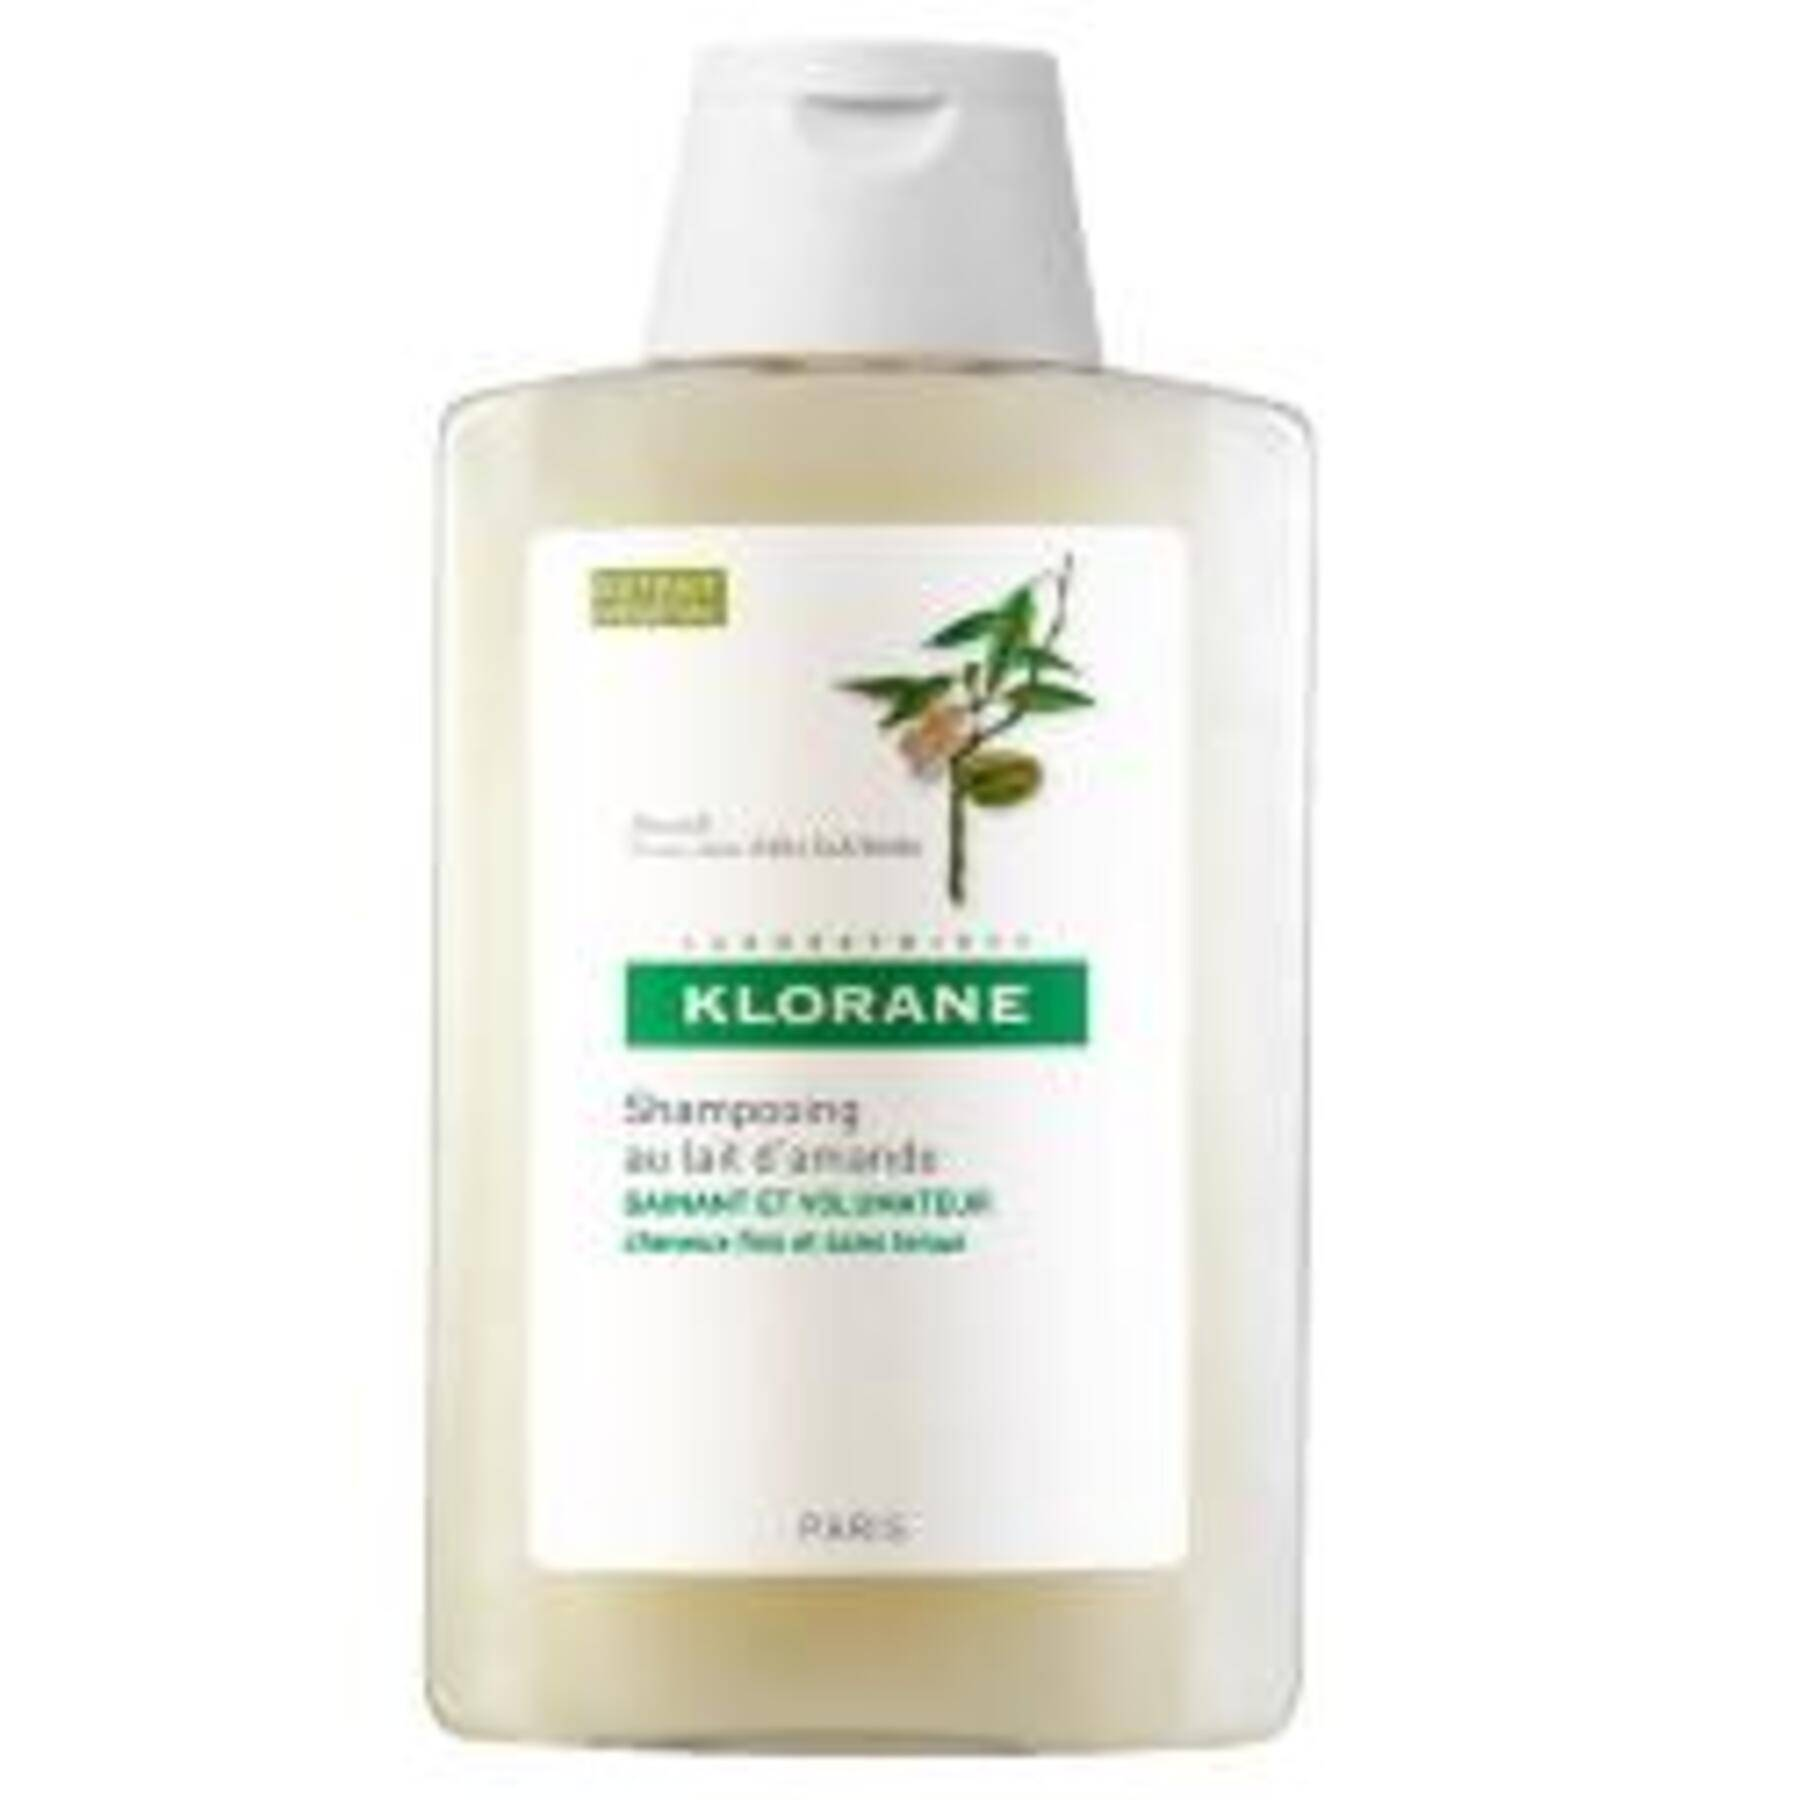 KLORANE (Pierre Fabre It. SpA) Klorane shampoo latte mandorla 200 ml